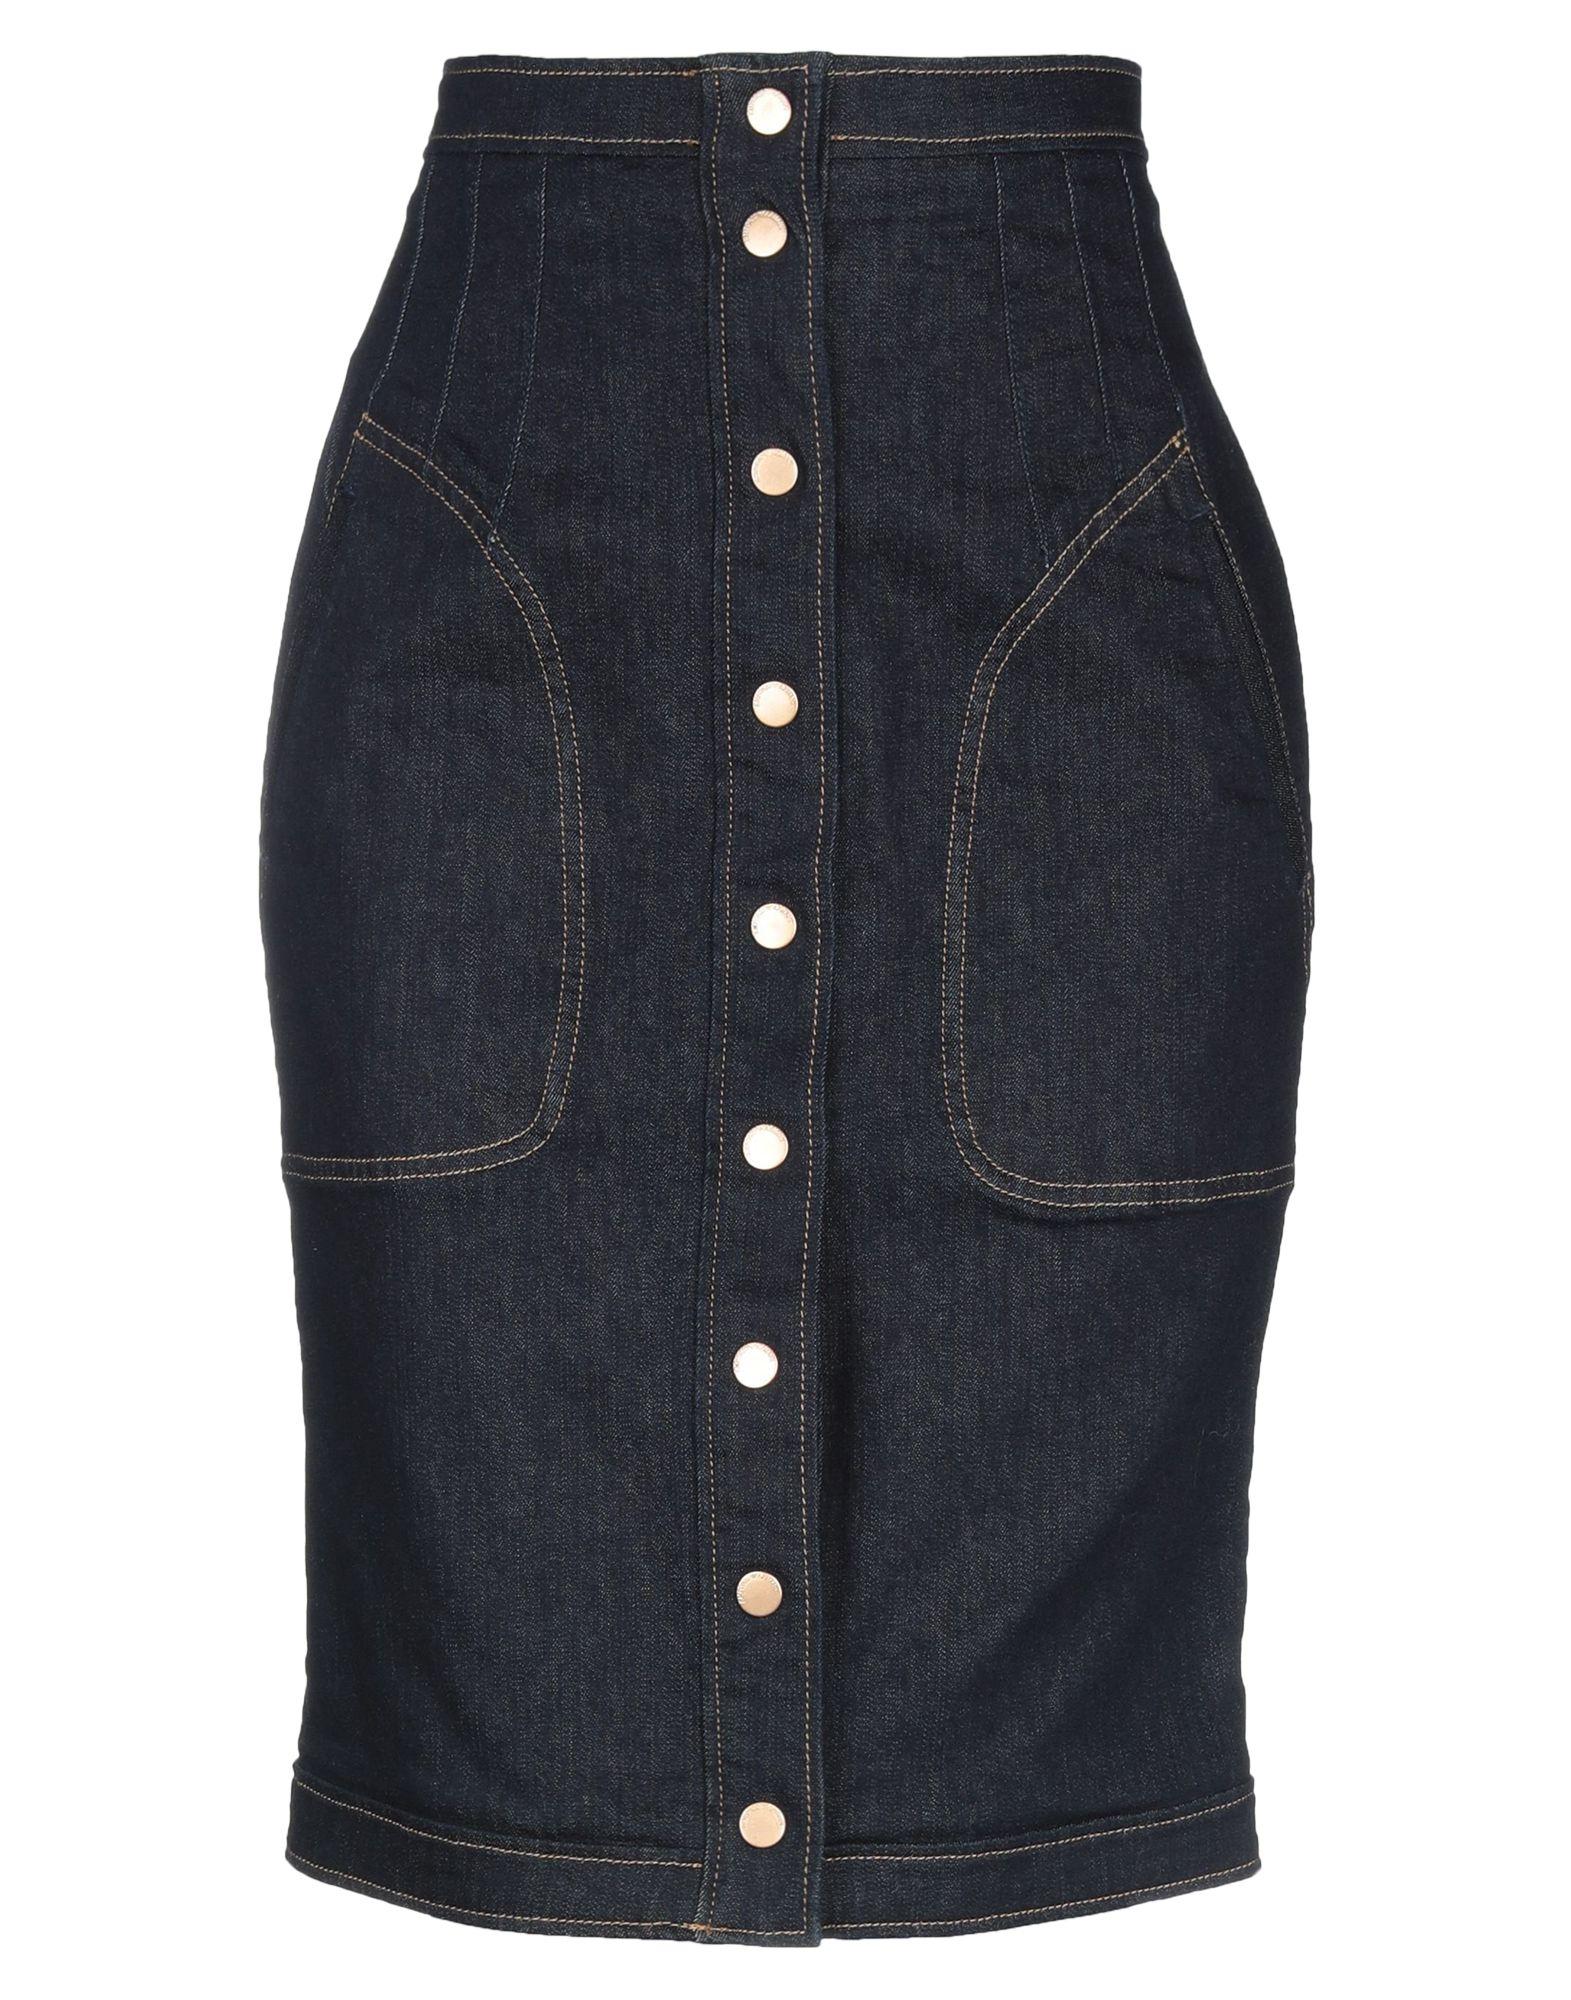 EMPORIO ARMANI Джинсовая юбка куртка джинсовая emporio armani emporio armani em598ewzwc83 page 2